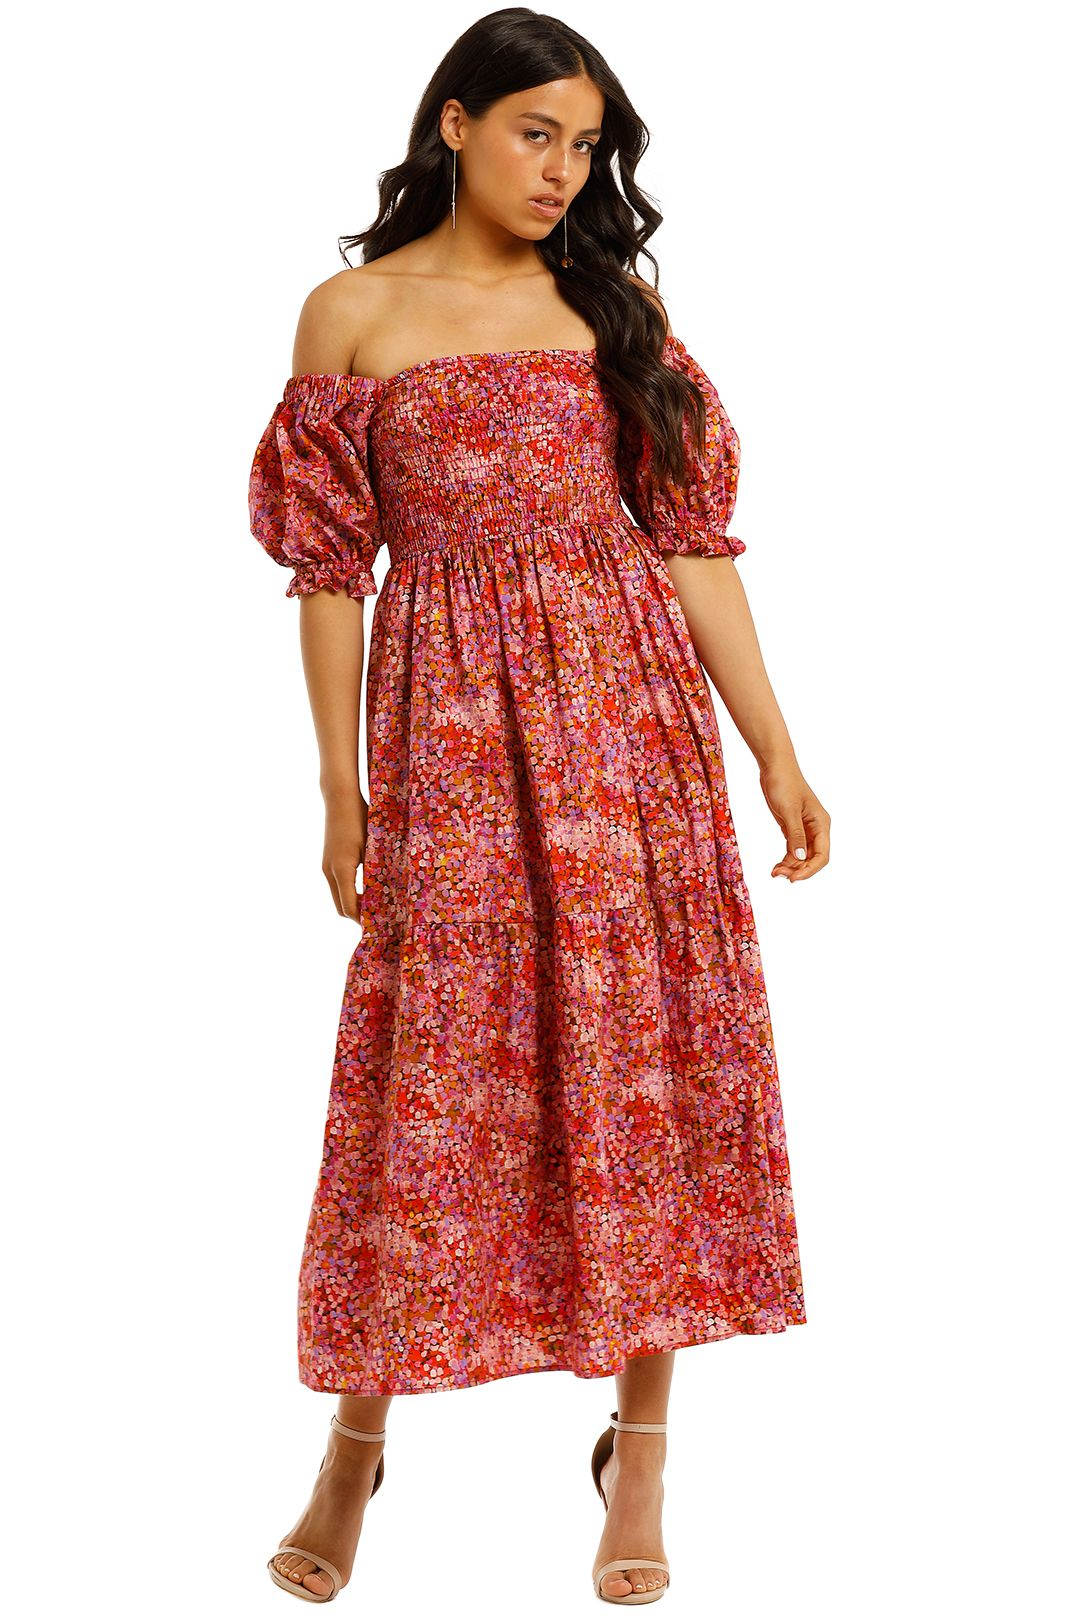 Kachel-Tilly-Shirred-Cotton-Midi-Dress-Front